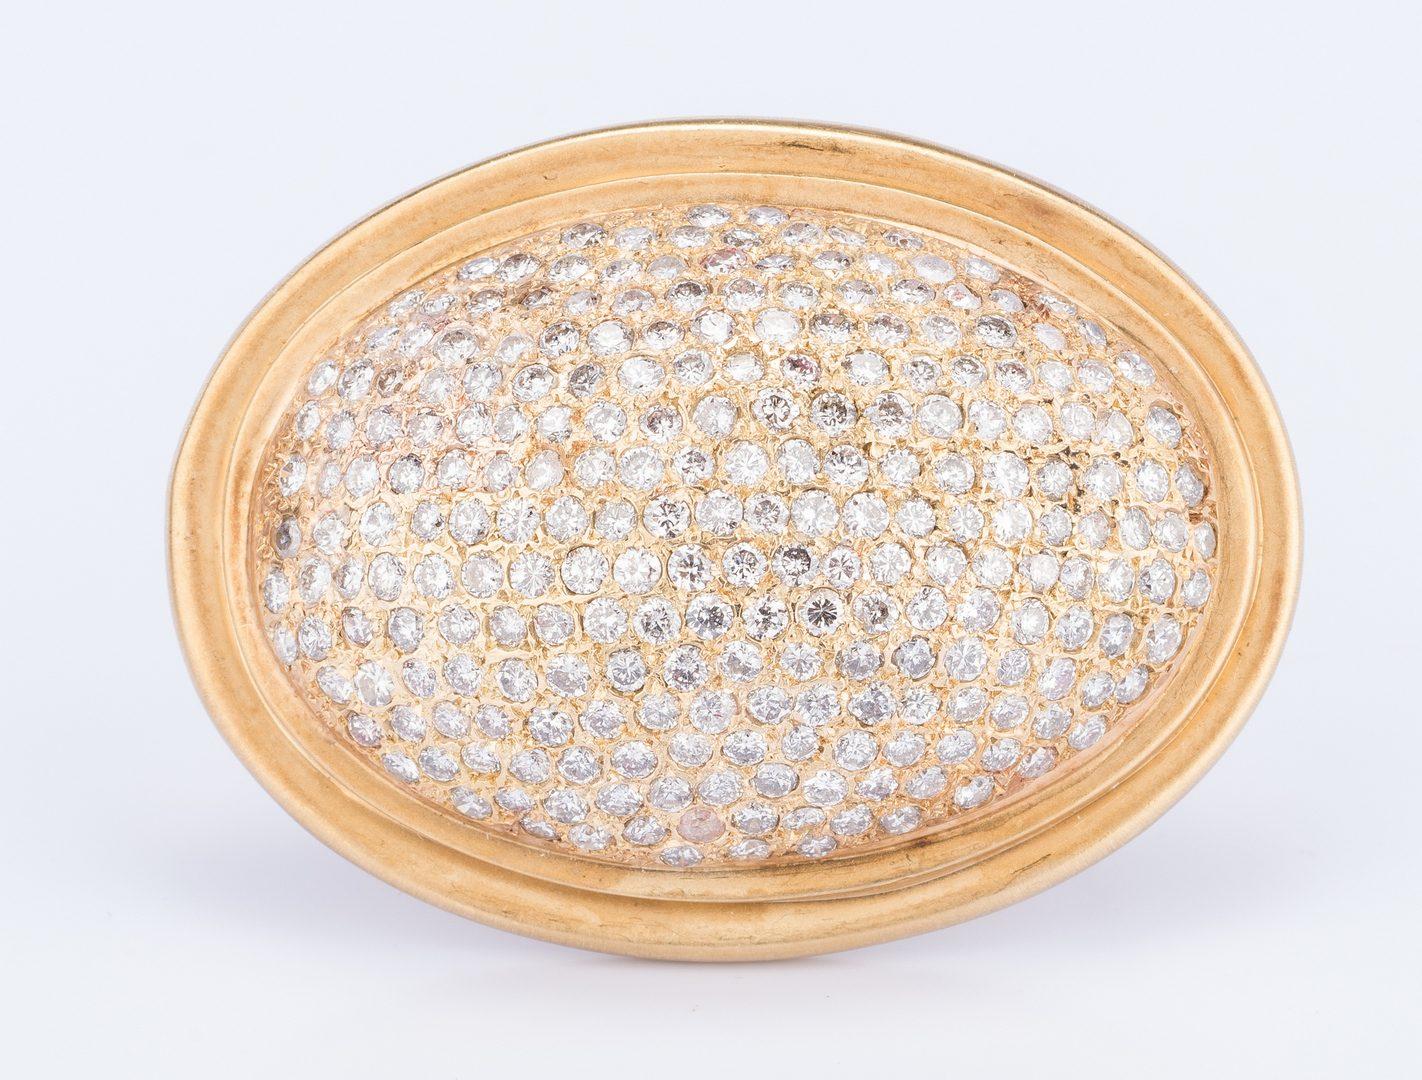 Lot 177: 18k Oval Pave' Diamond Pin/Pendant, 4.65ct